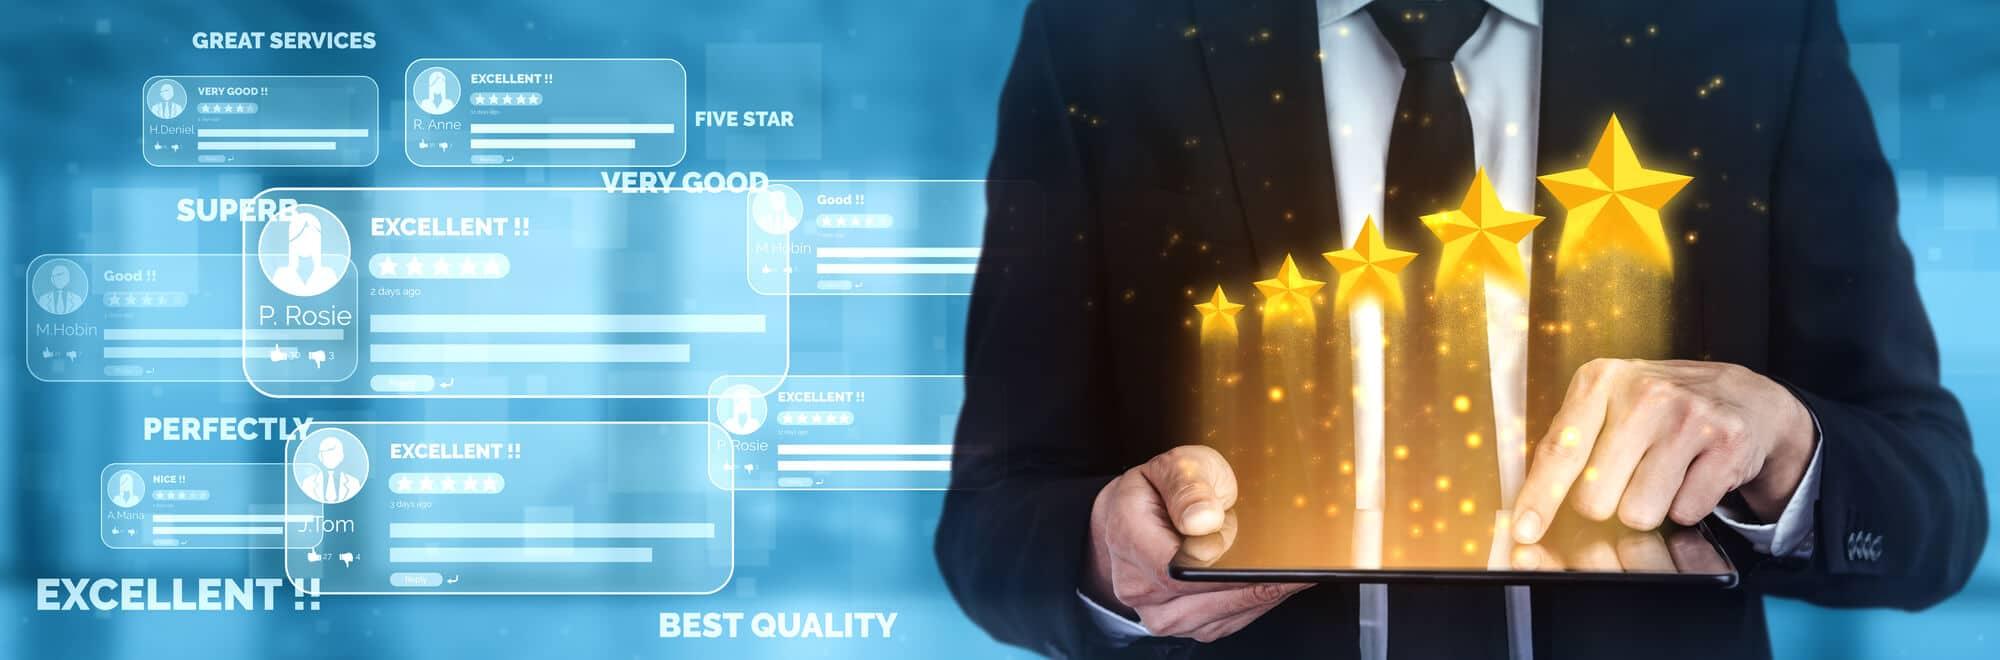 business reputation management services